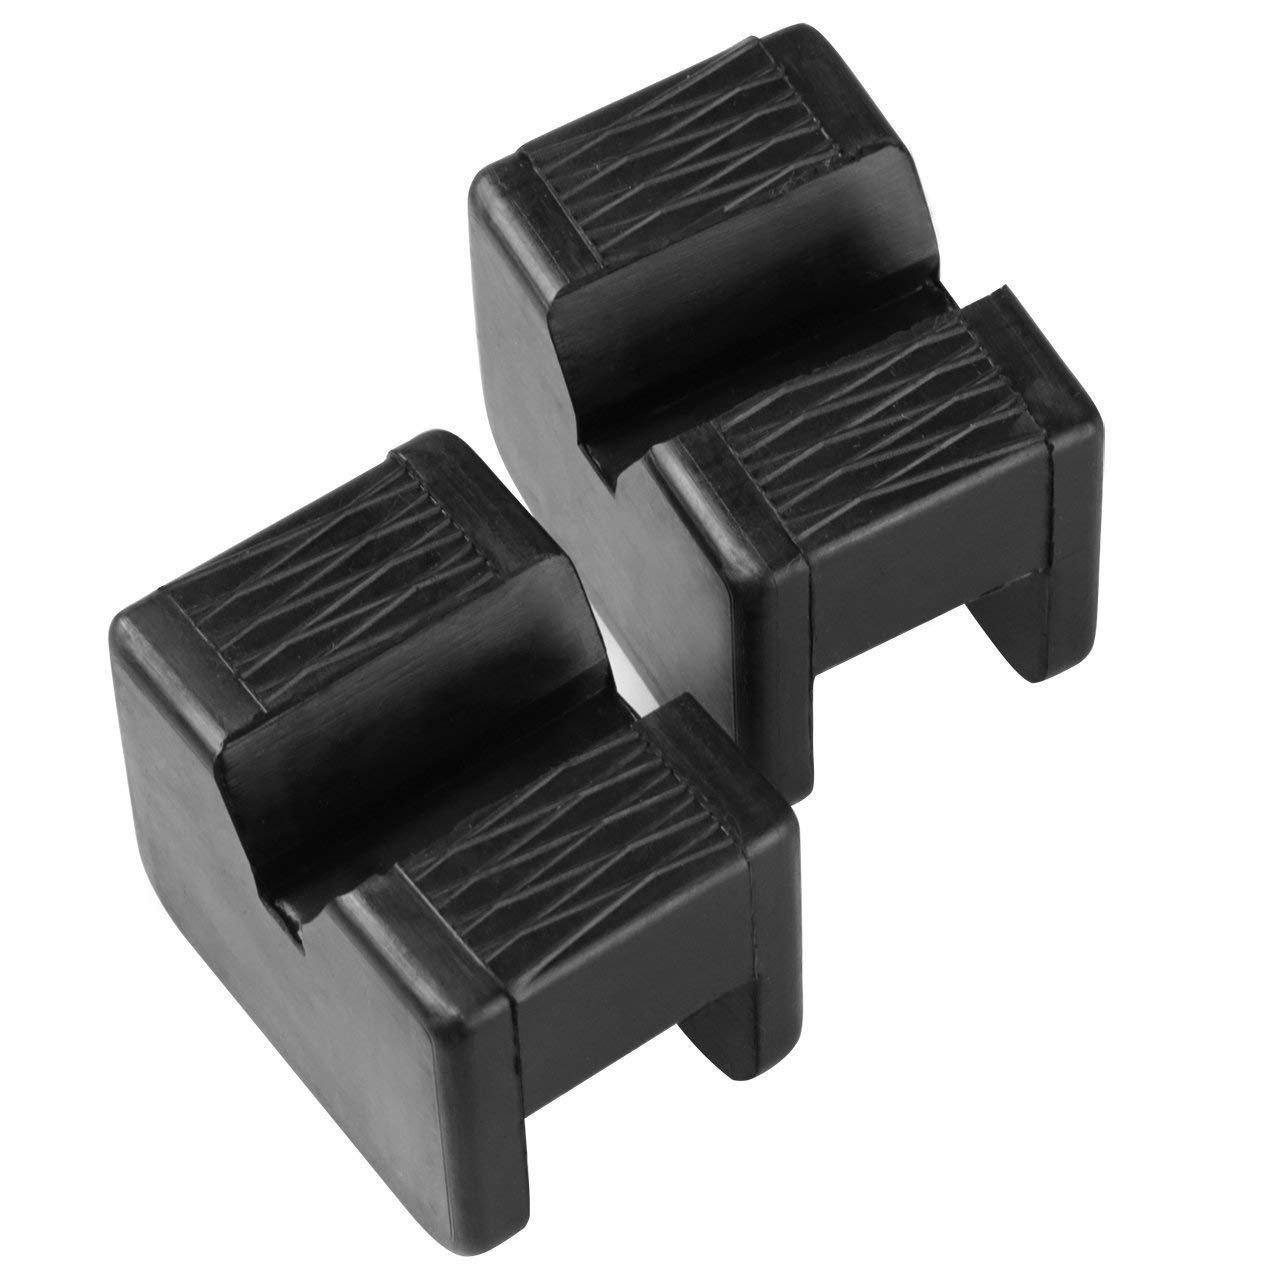 2pcs Jack Pad Universal Slotted Rubber Frame Rail